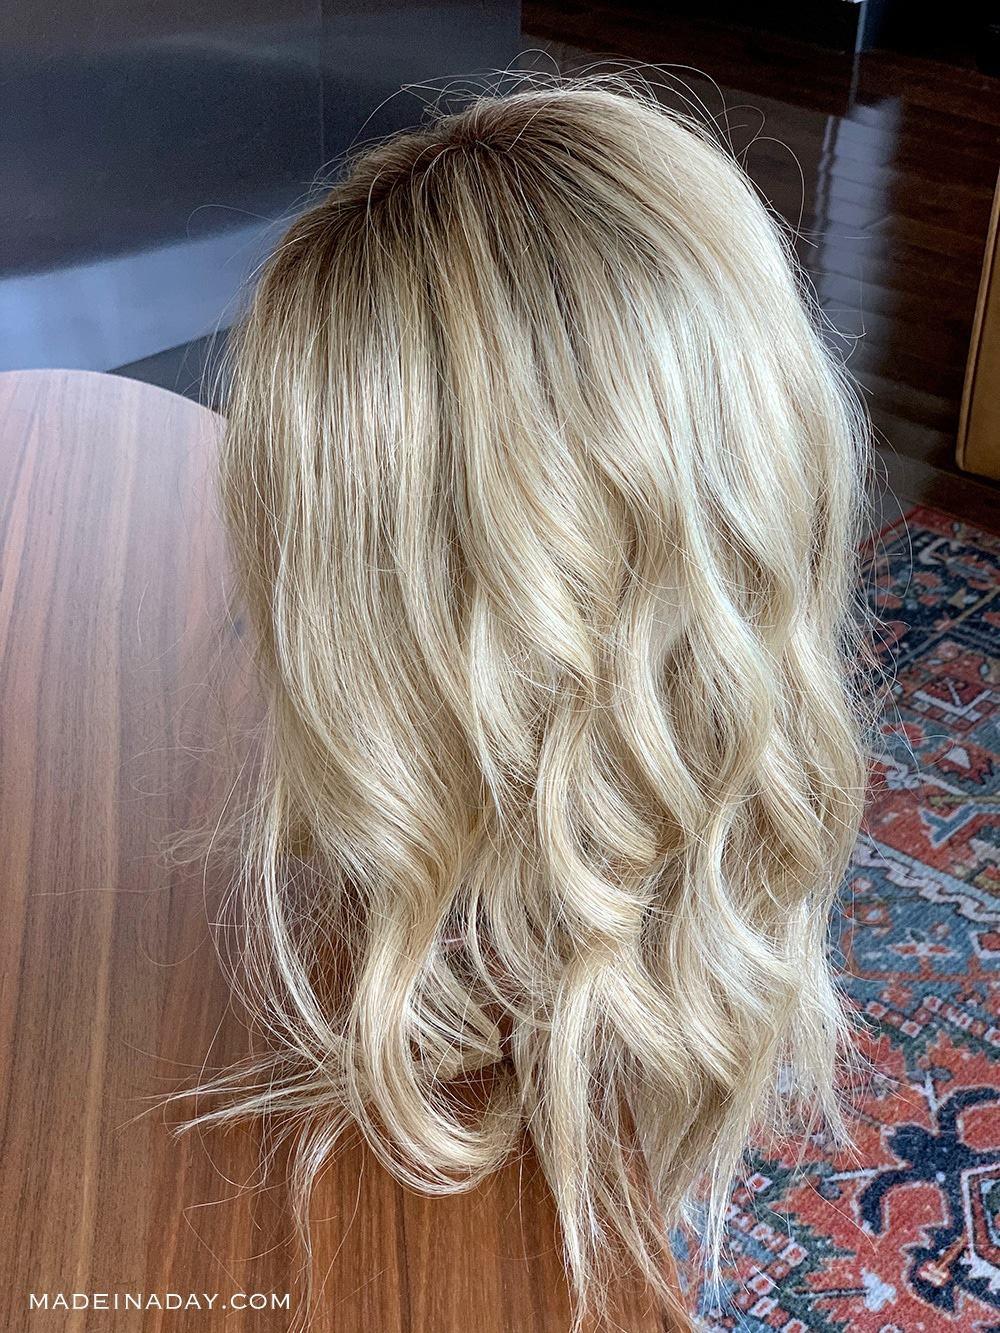 Beach Wave top Smart Human Hair Topper Review, Venice Blonde 22F16S8 Jon Renau